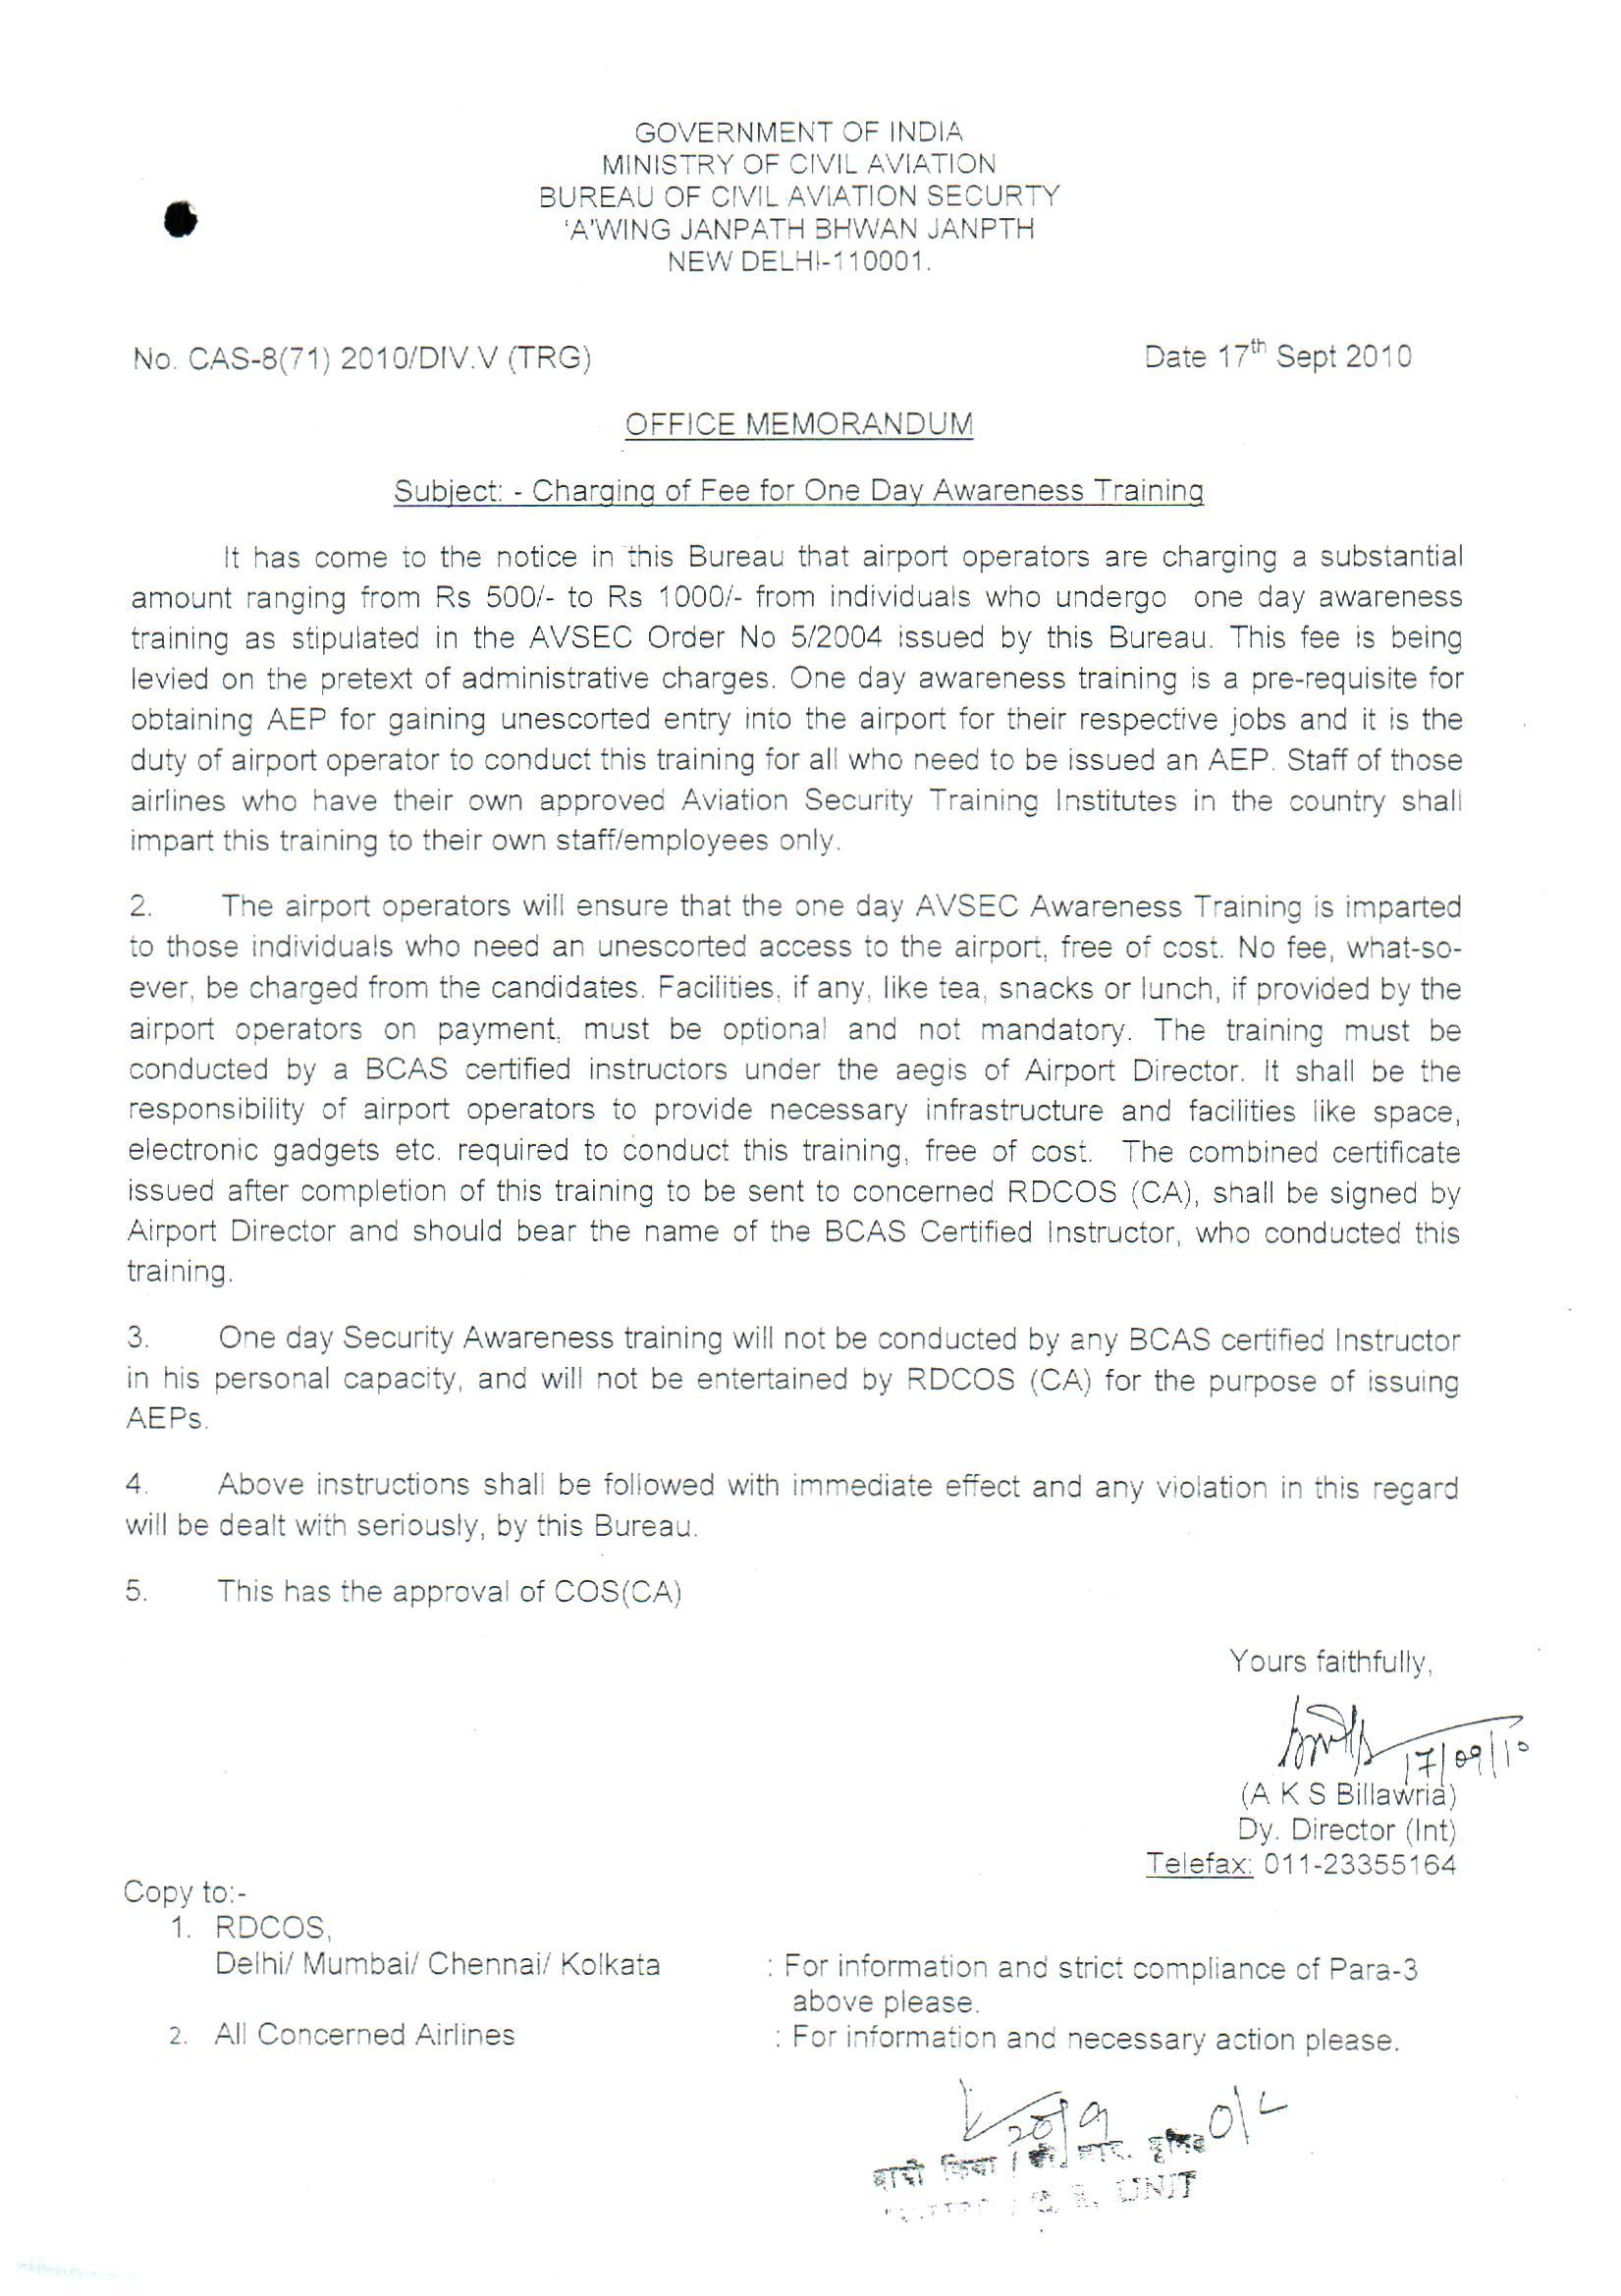 bcas avsec training office memorandum charging of fee for one day awareness training